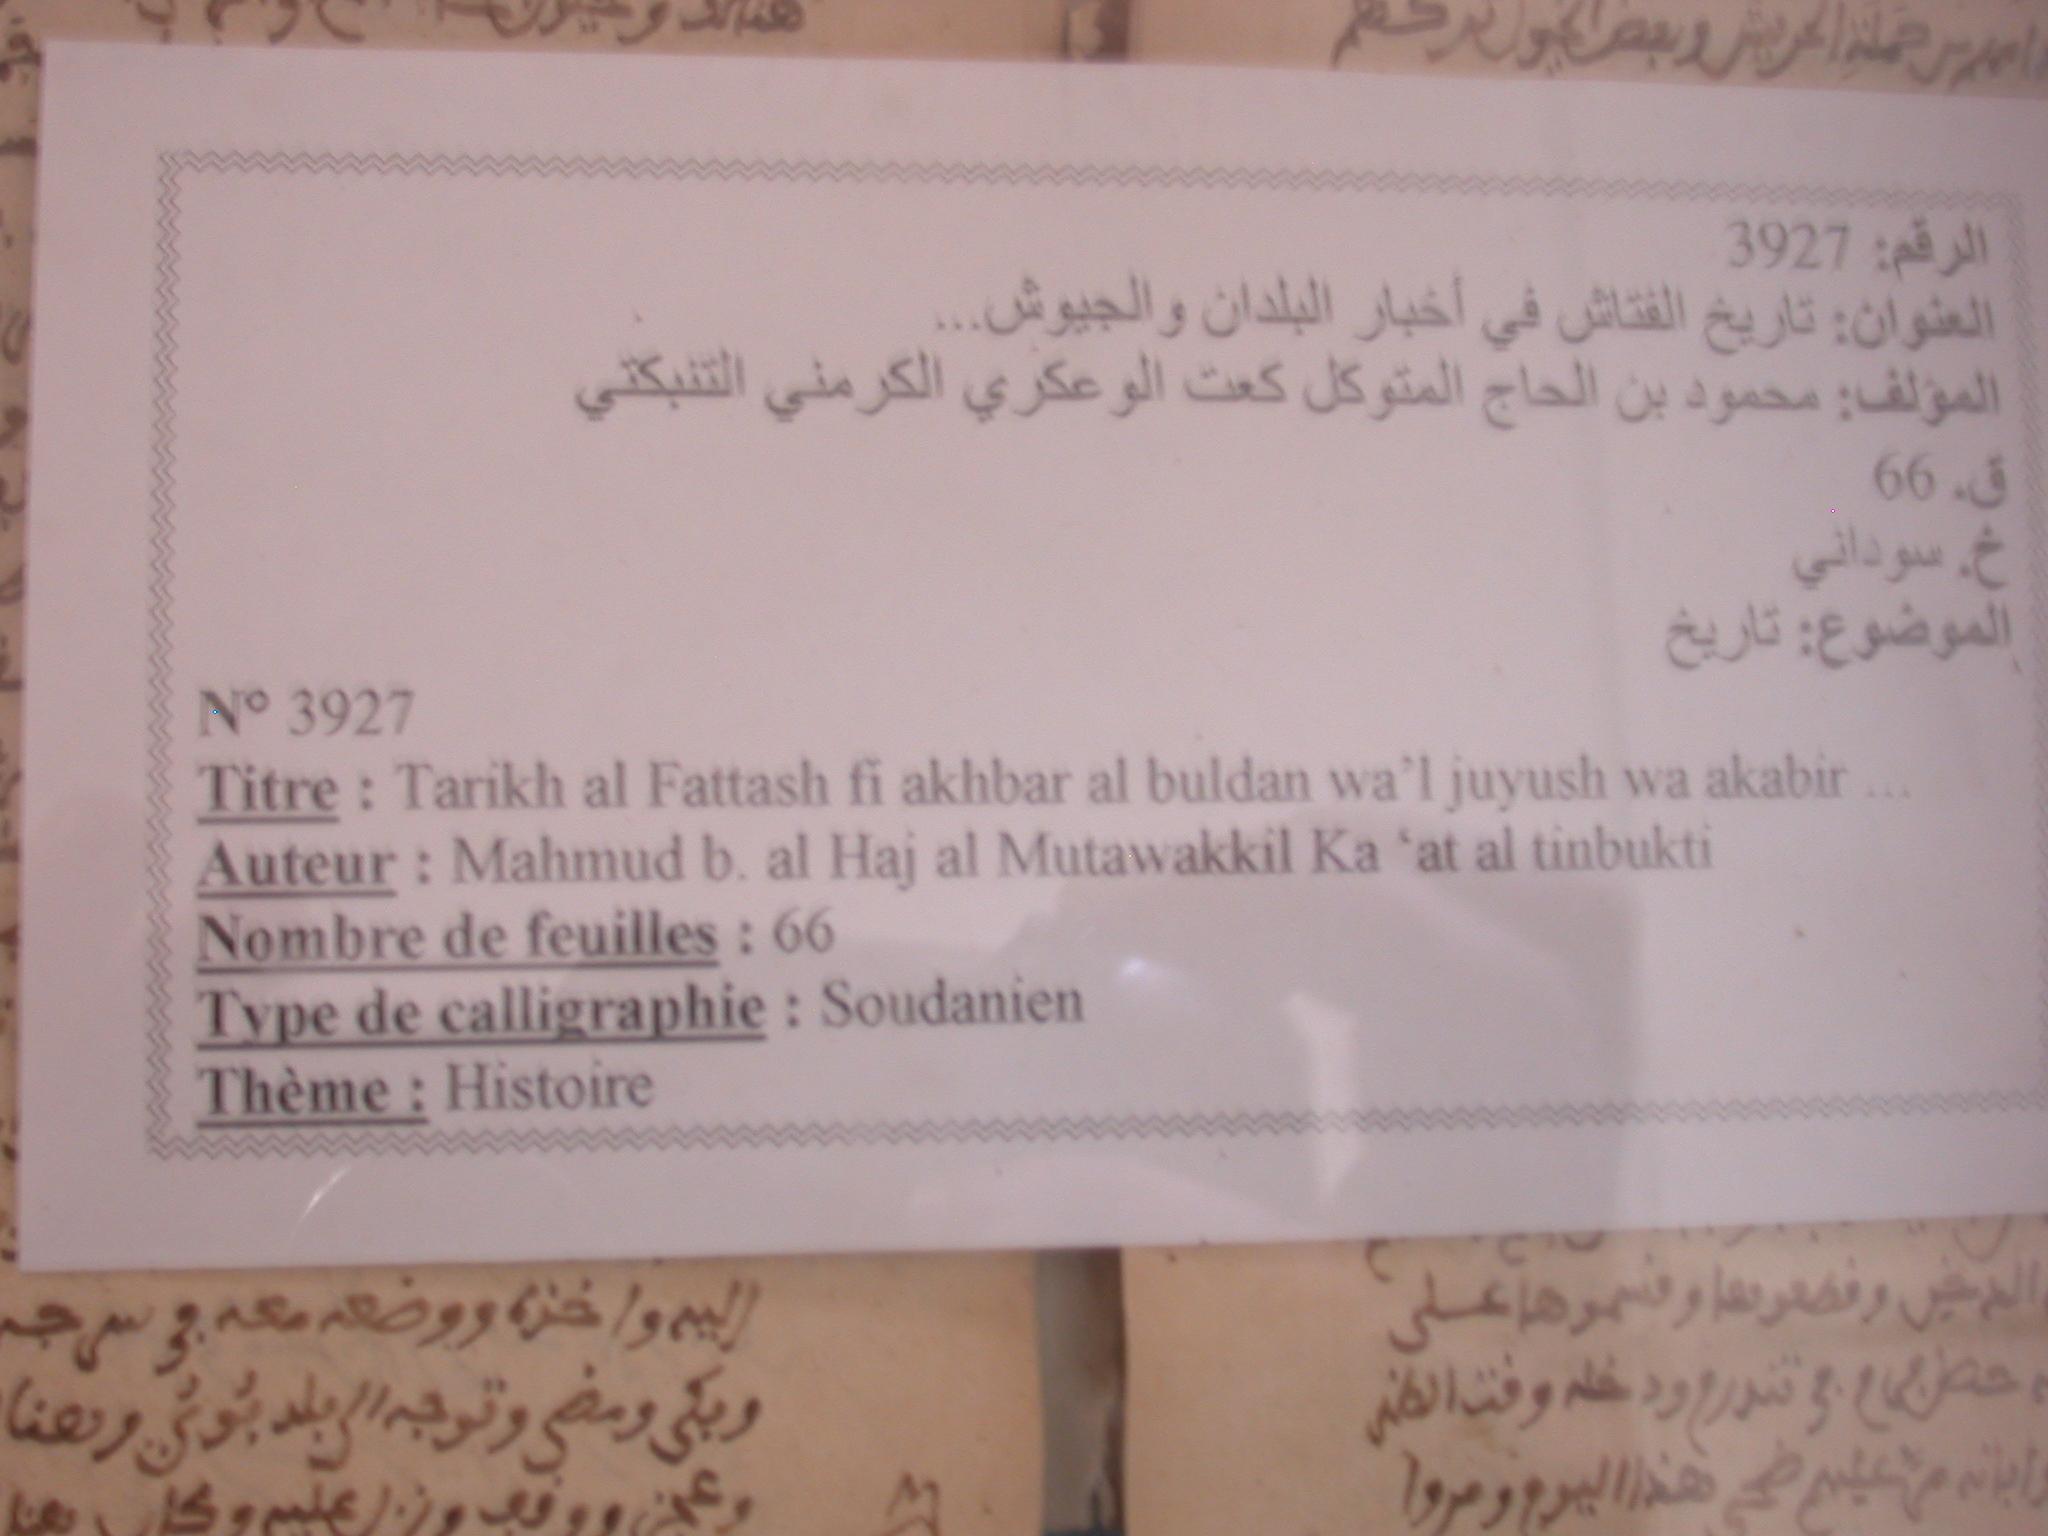 Manuscript, Tarikh al Fattash fi akhbar al buldan wal juyush wa akabir, Detail, Ahmed Baba Institute, Institut des Hautes Etudes et de Recherches Islamiques, Timbuktu, Mali